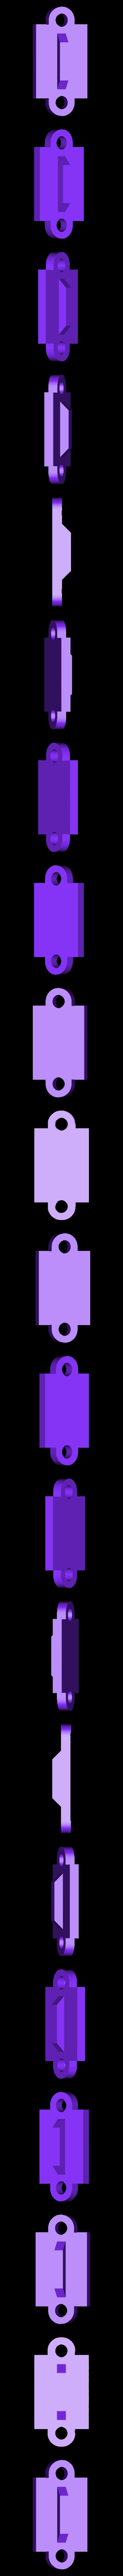 Motor_Plate_1.stl Download free STL file Simula 5 Robot Developers Kit • 3D printable model, JamieLaing